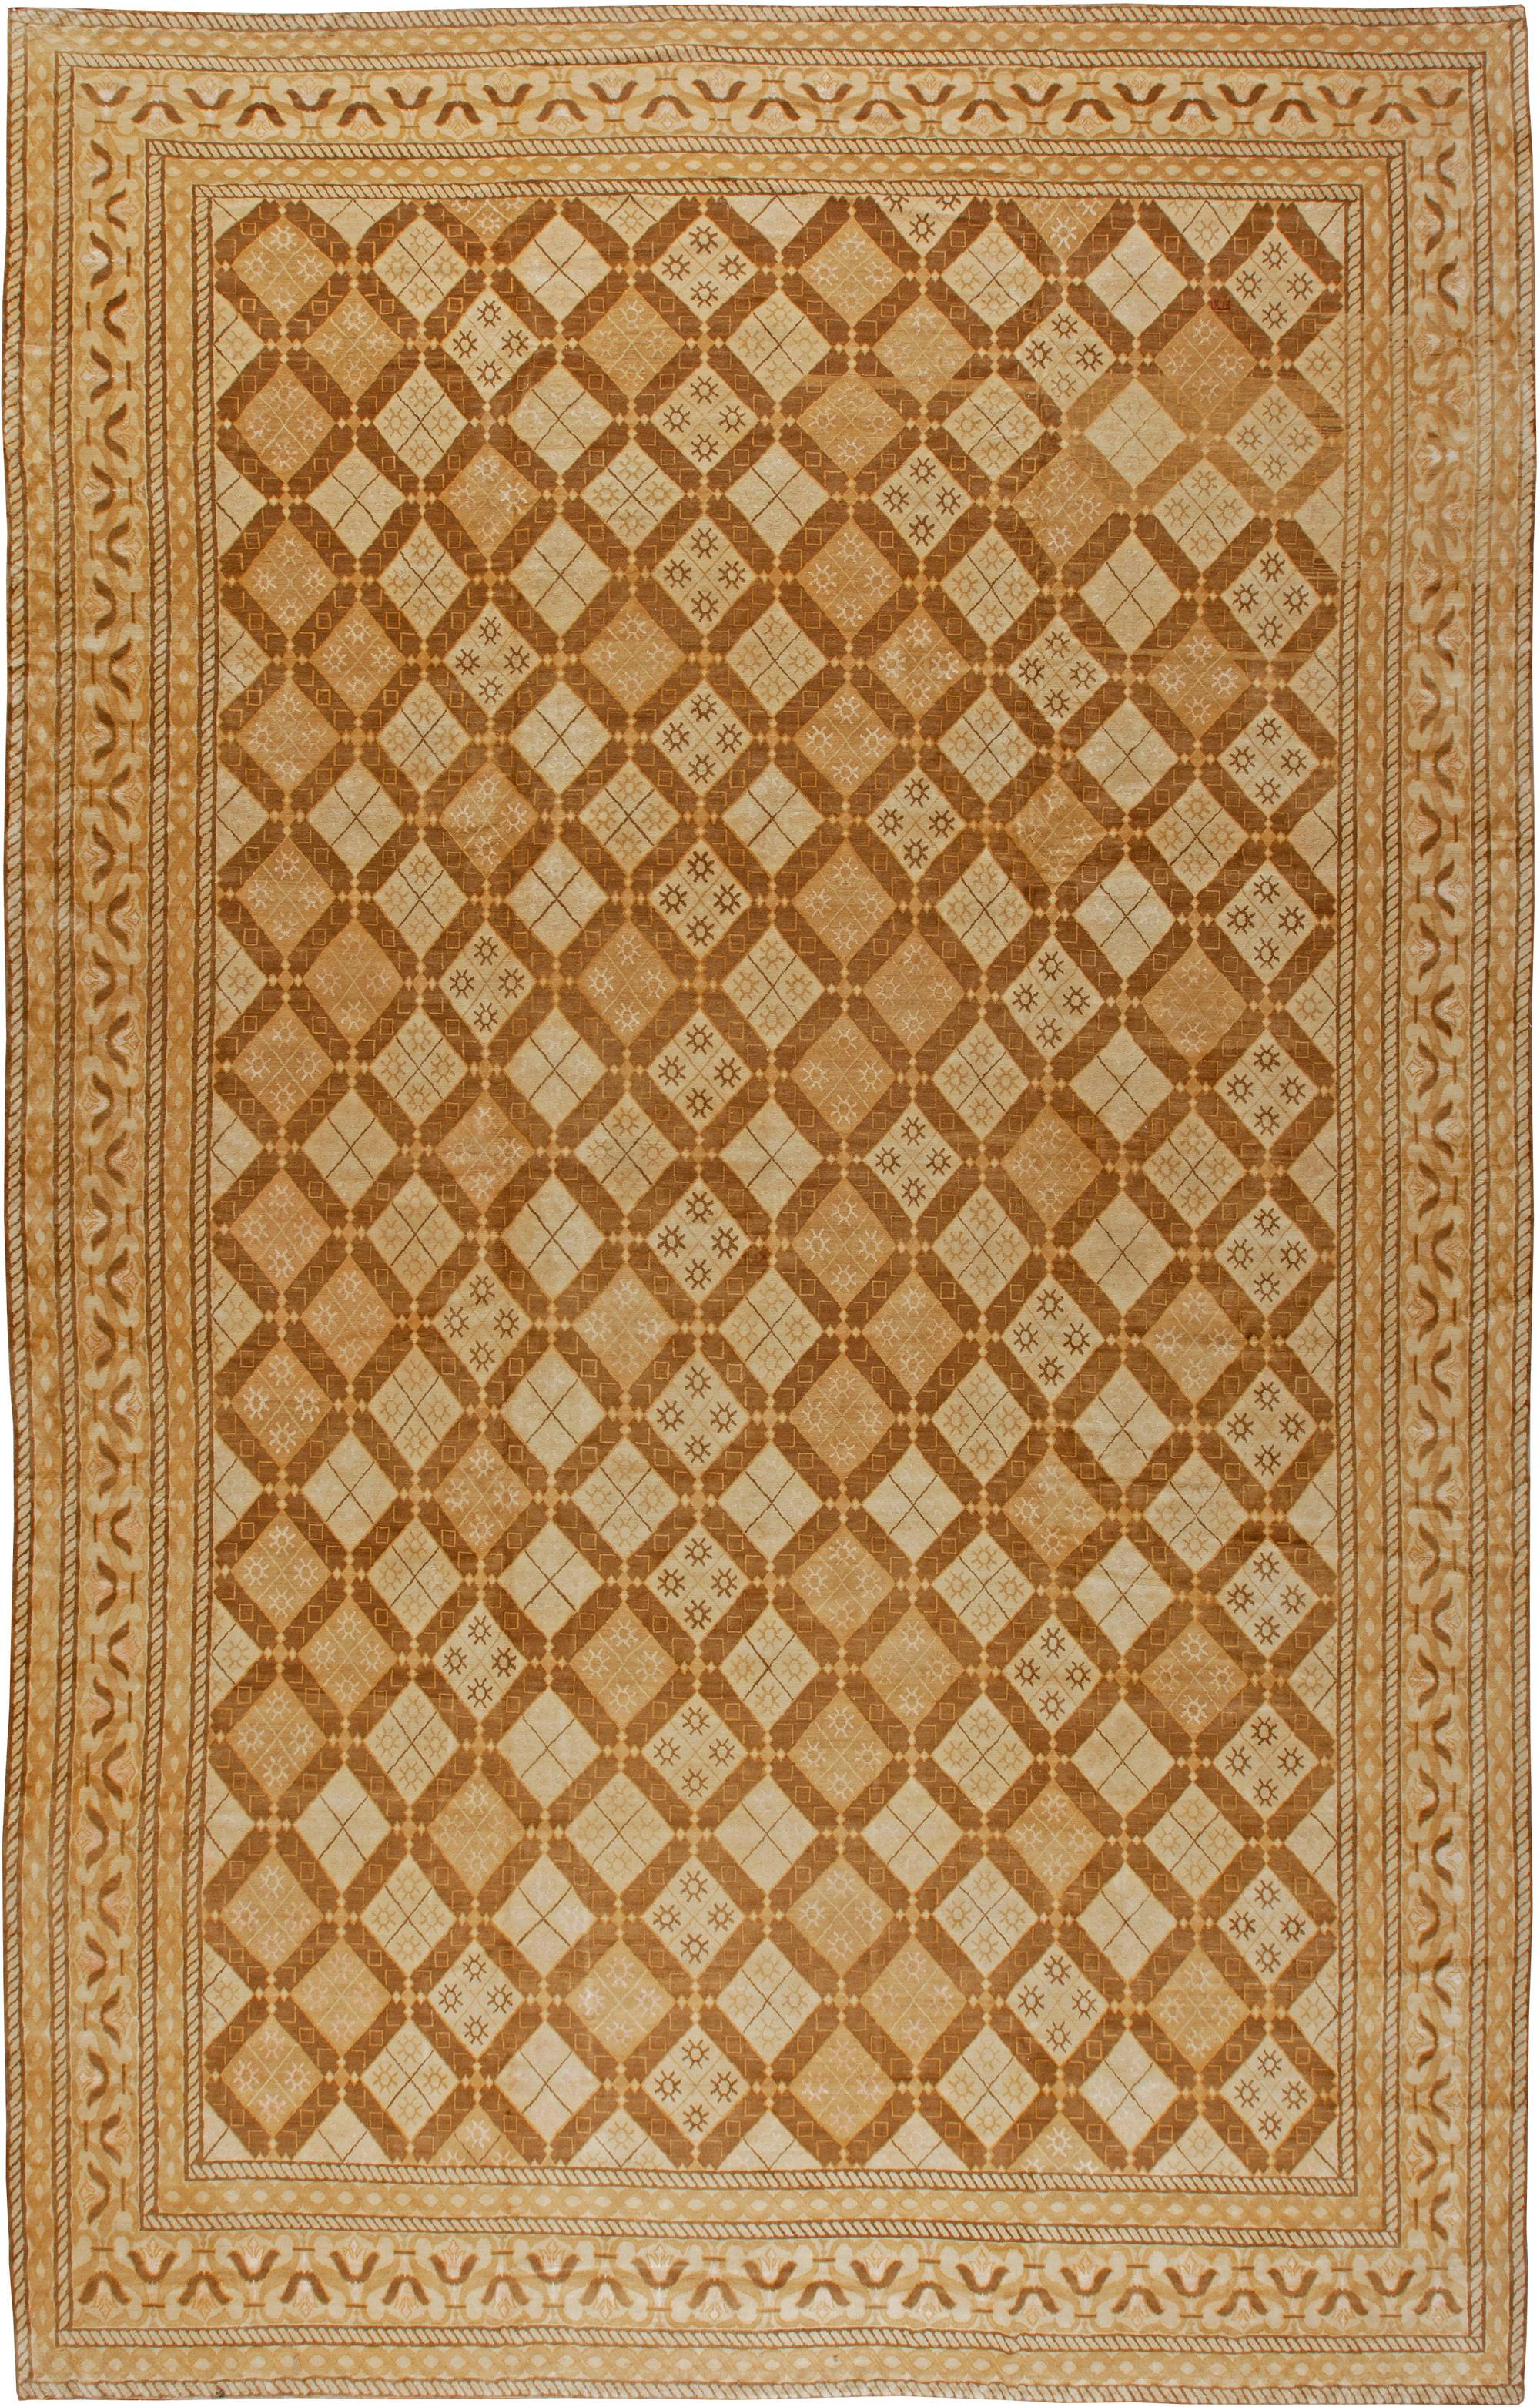 Tibetan Rugs Nepal Carpets For Sale Large Area Wool